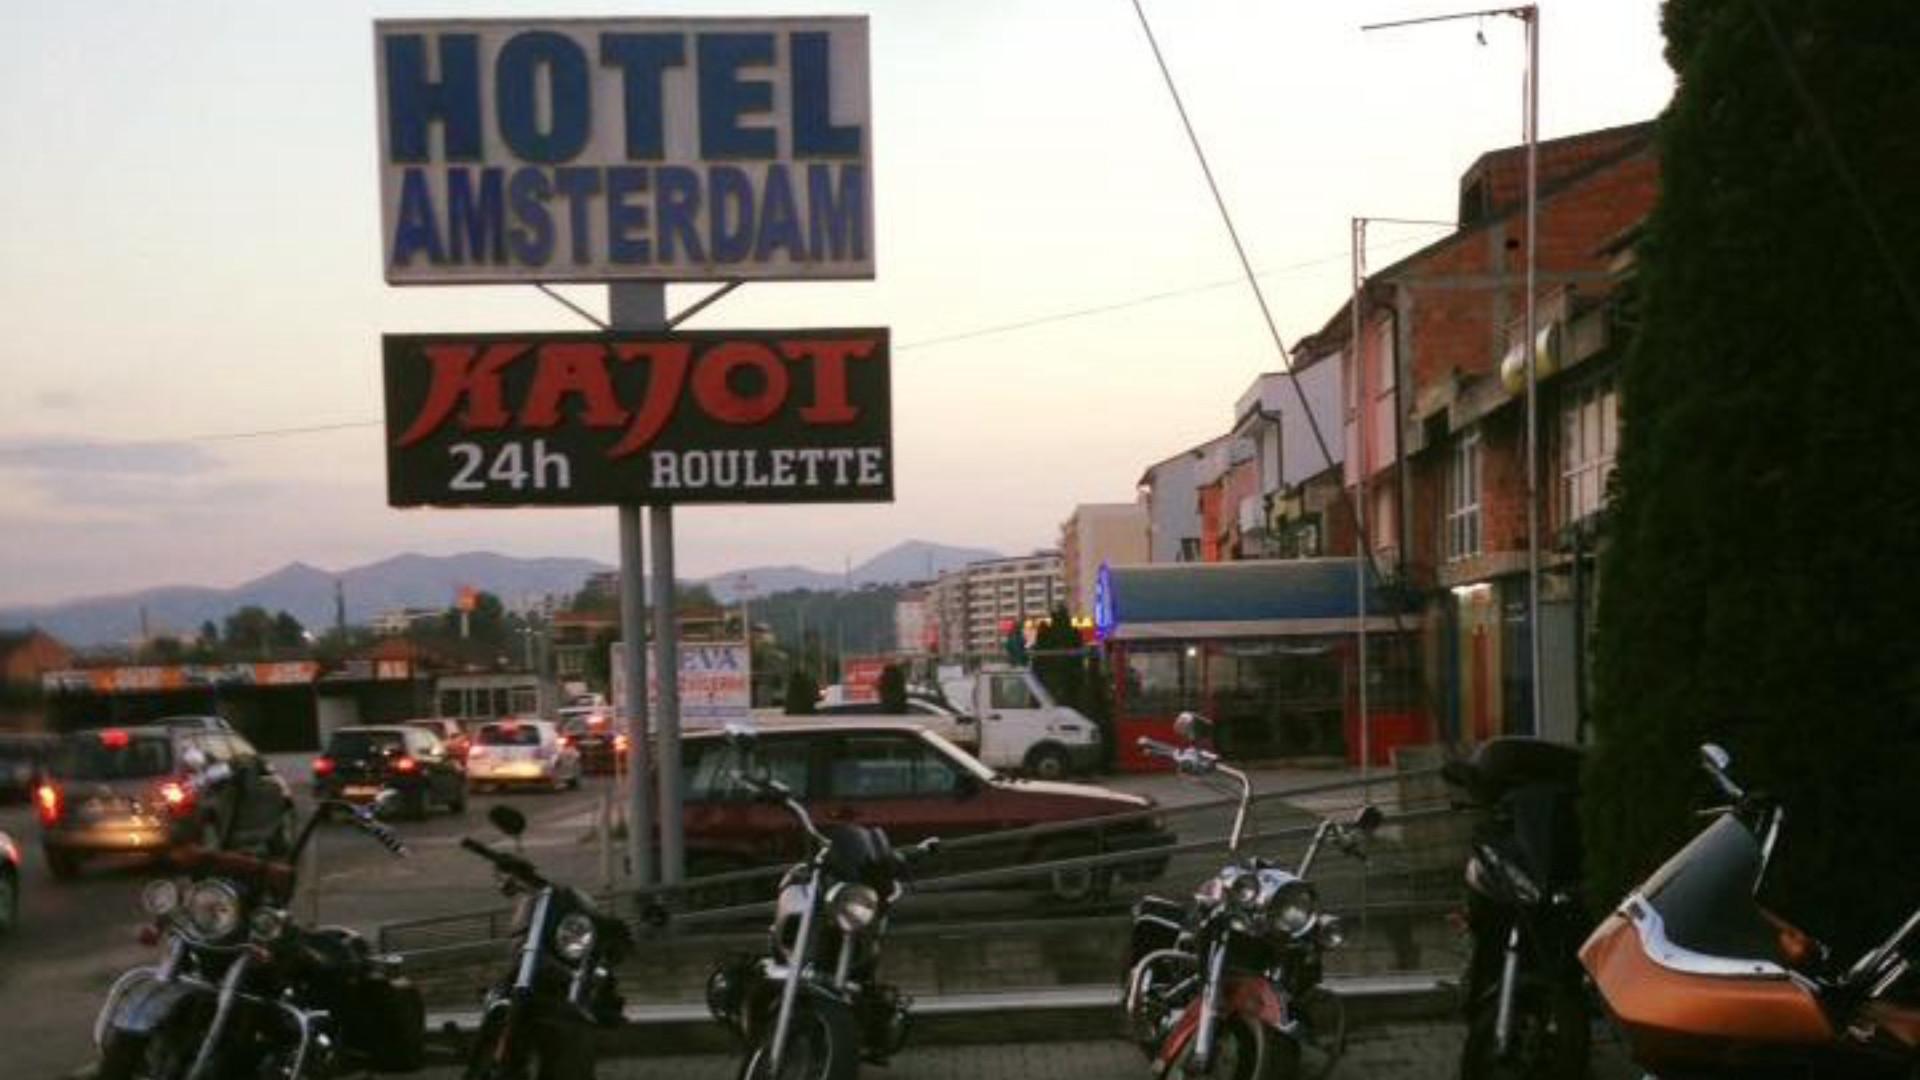 Hotel Amsterdam